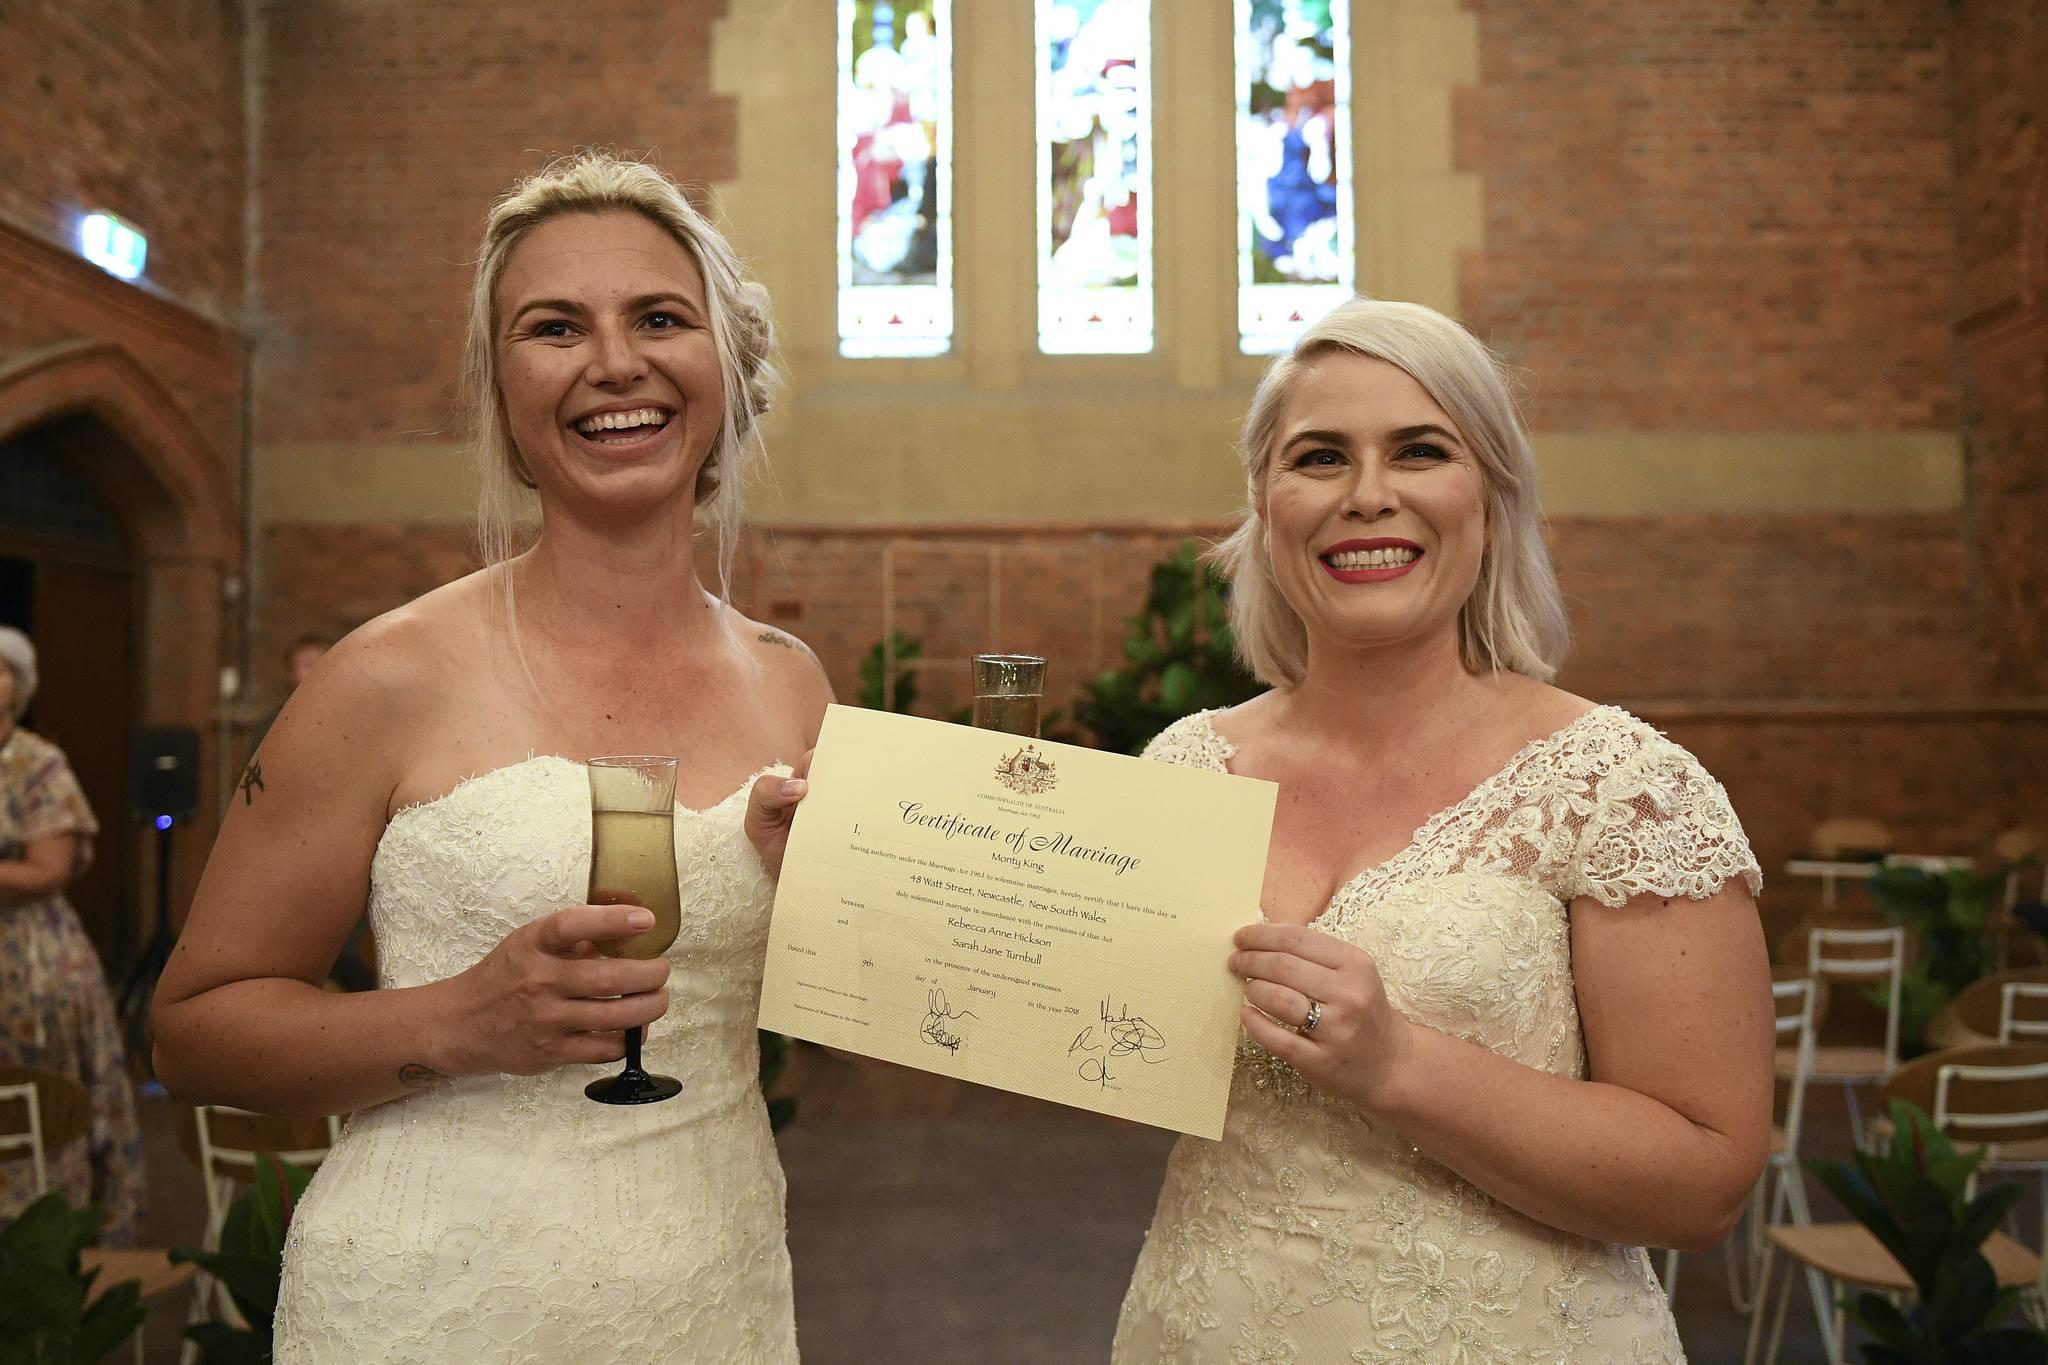 Sarah Turnbull (왼쪽)과 Rebecca Hickson이 9 일 호주 뉴 사우스 웨일즈 주 뉴캐슬에서 결혼식을 한 뒤 결혼 증명서를 들고 기념촬영을 하고 있다. [EPA=연합뉴스]